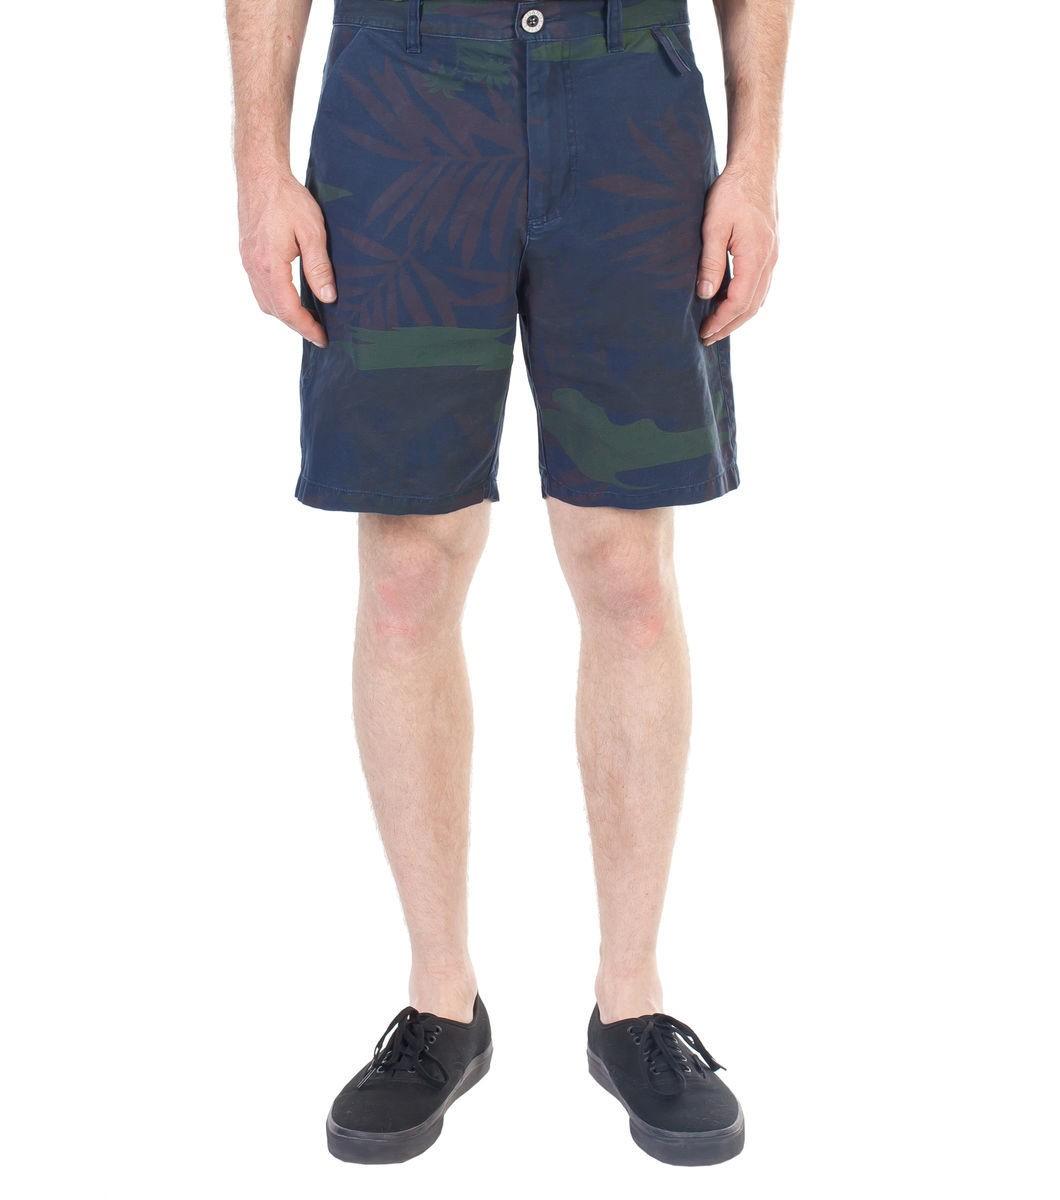 Stitchless Camo Short